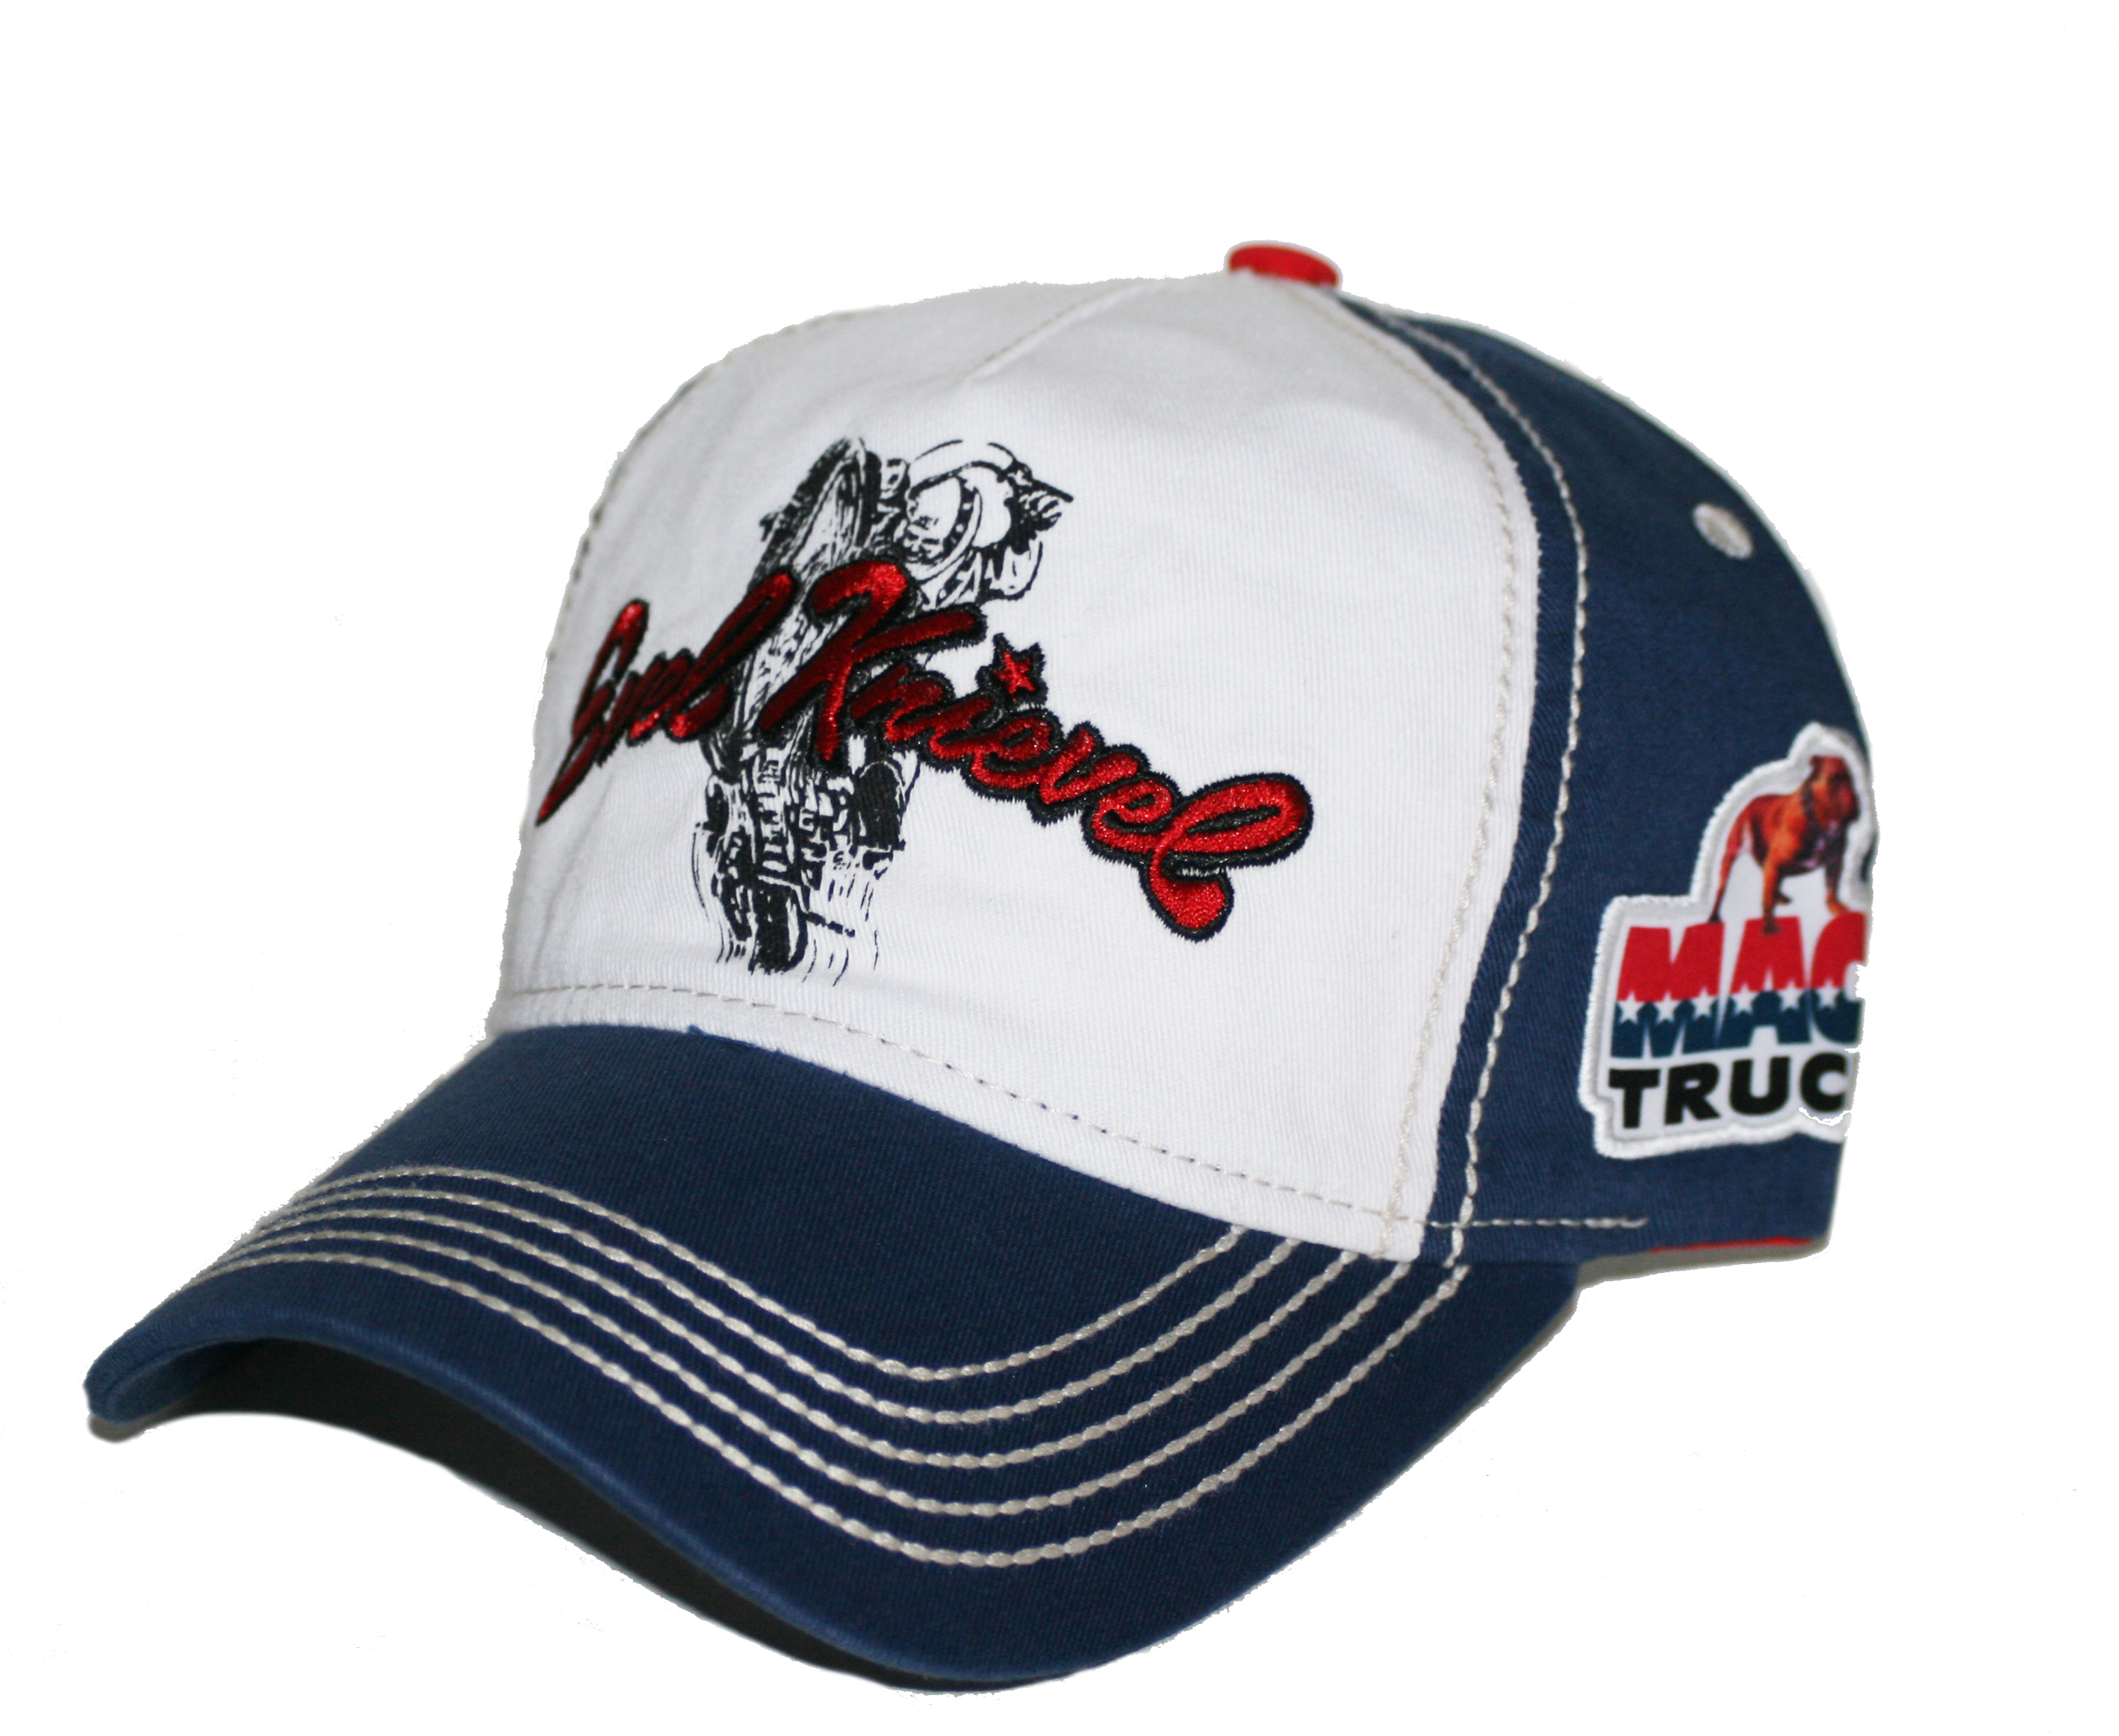 Mack Truck Merchandise Mack Truck Hats Mack Trucks Evel Knievel Jump Cap Mack Trucks Evel